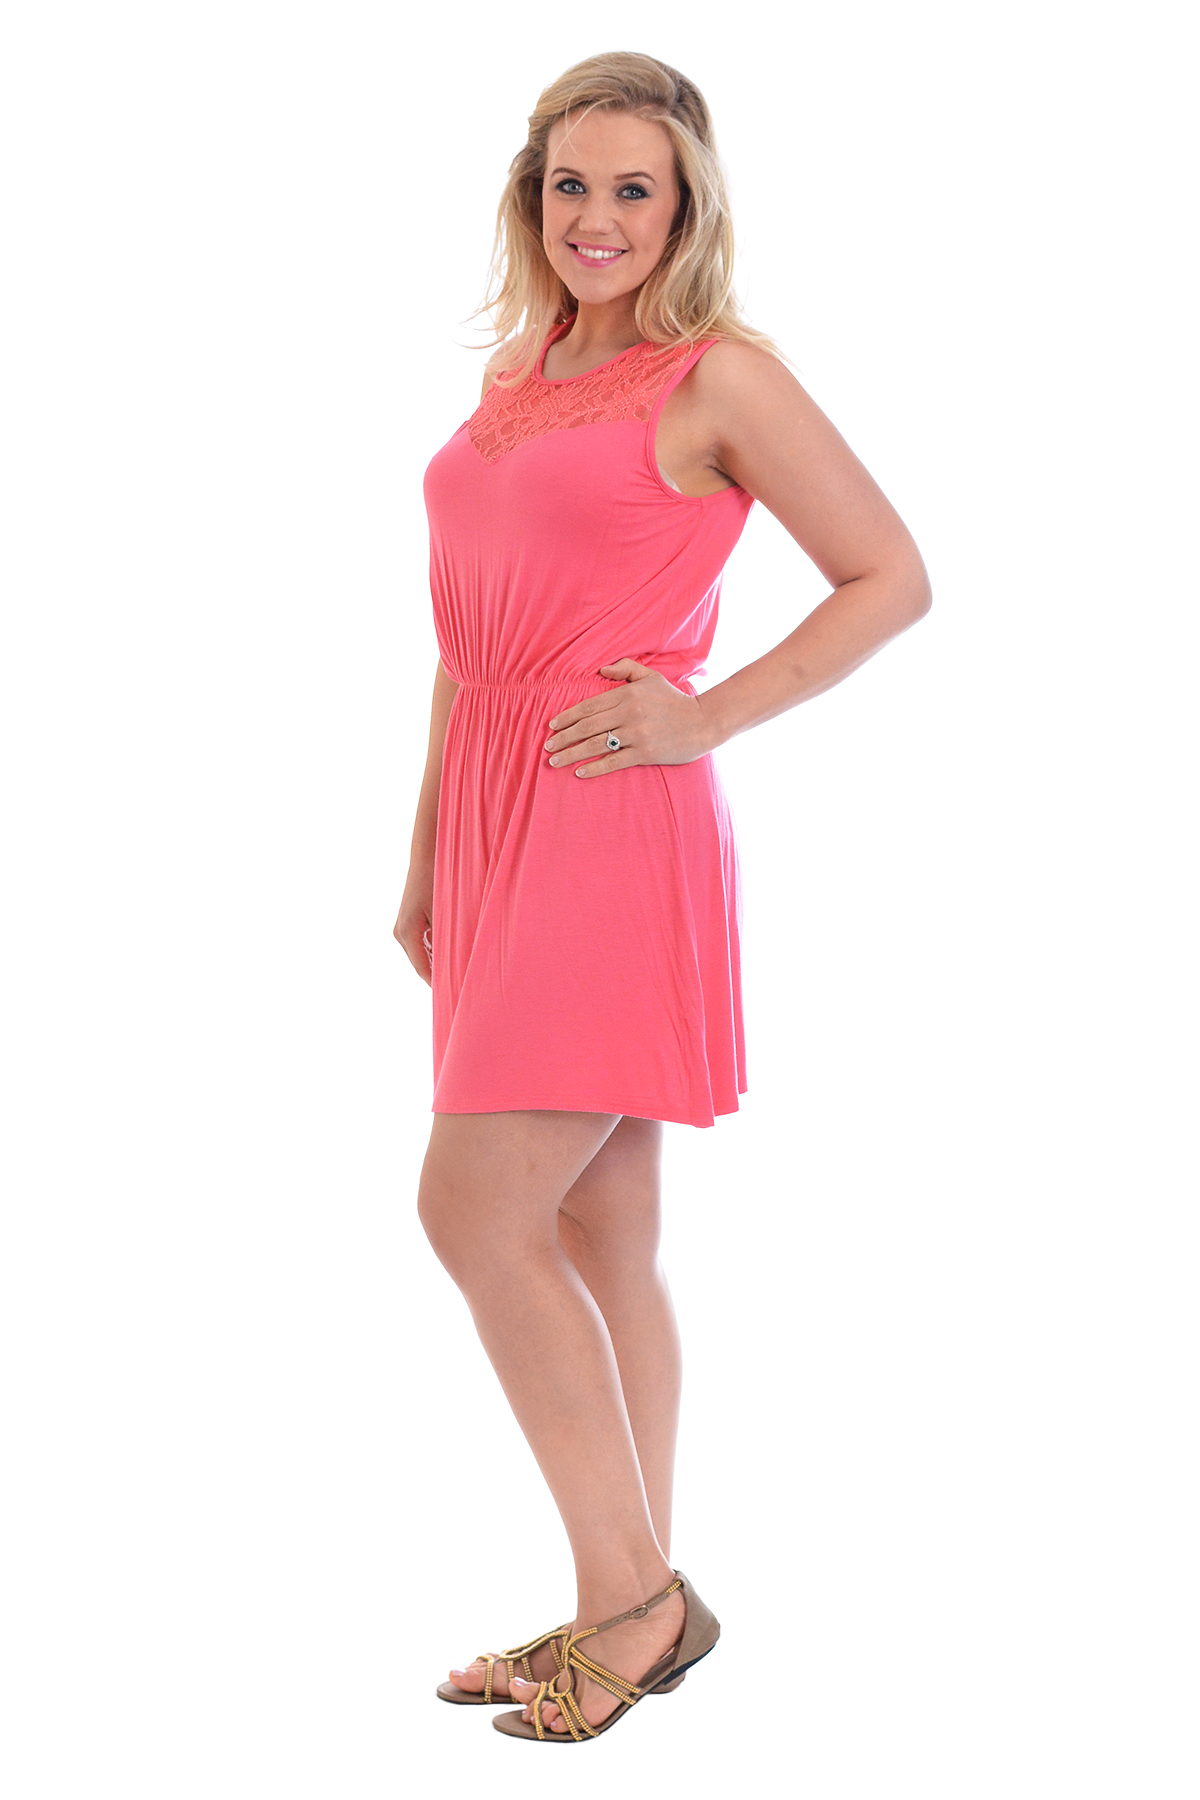 New Ladies Plus Size Dress Womens Tunic Floral Lace Neck